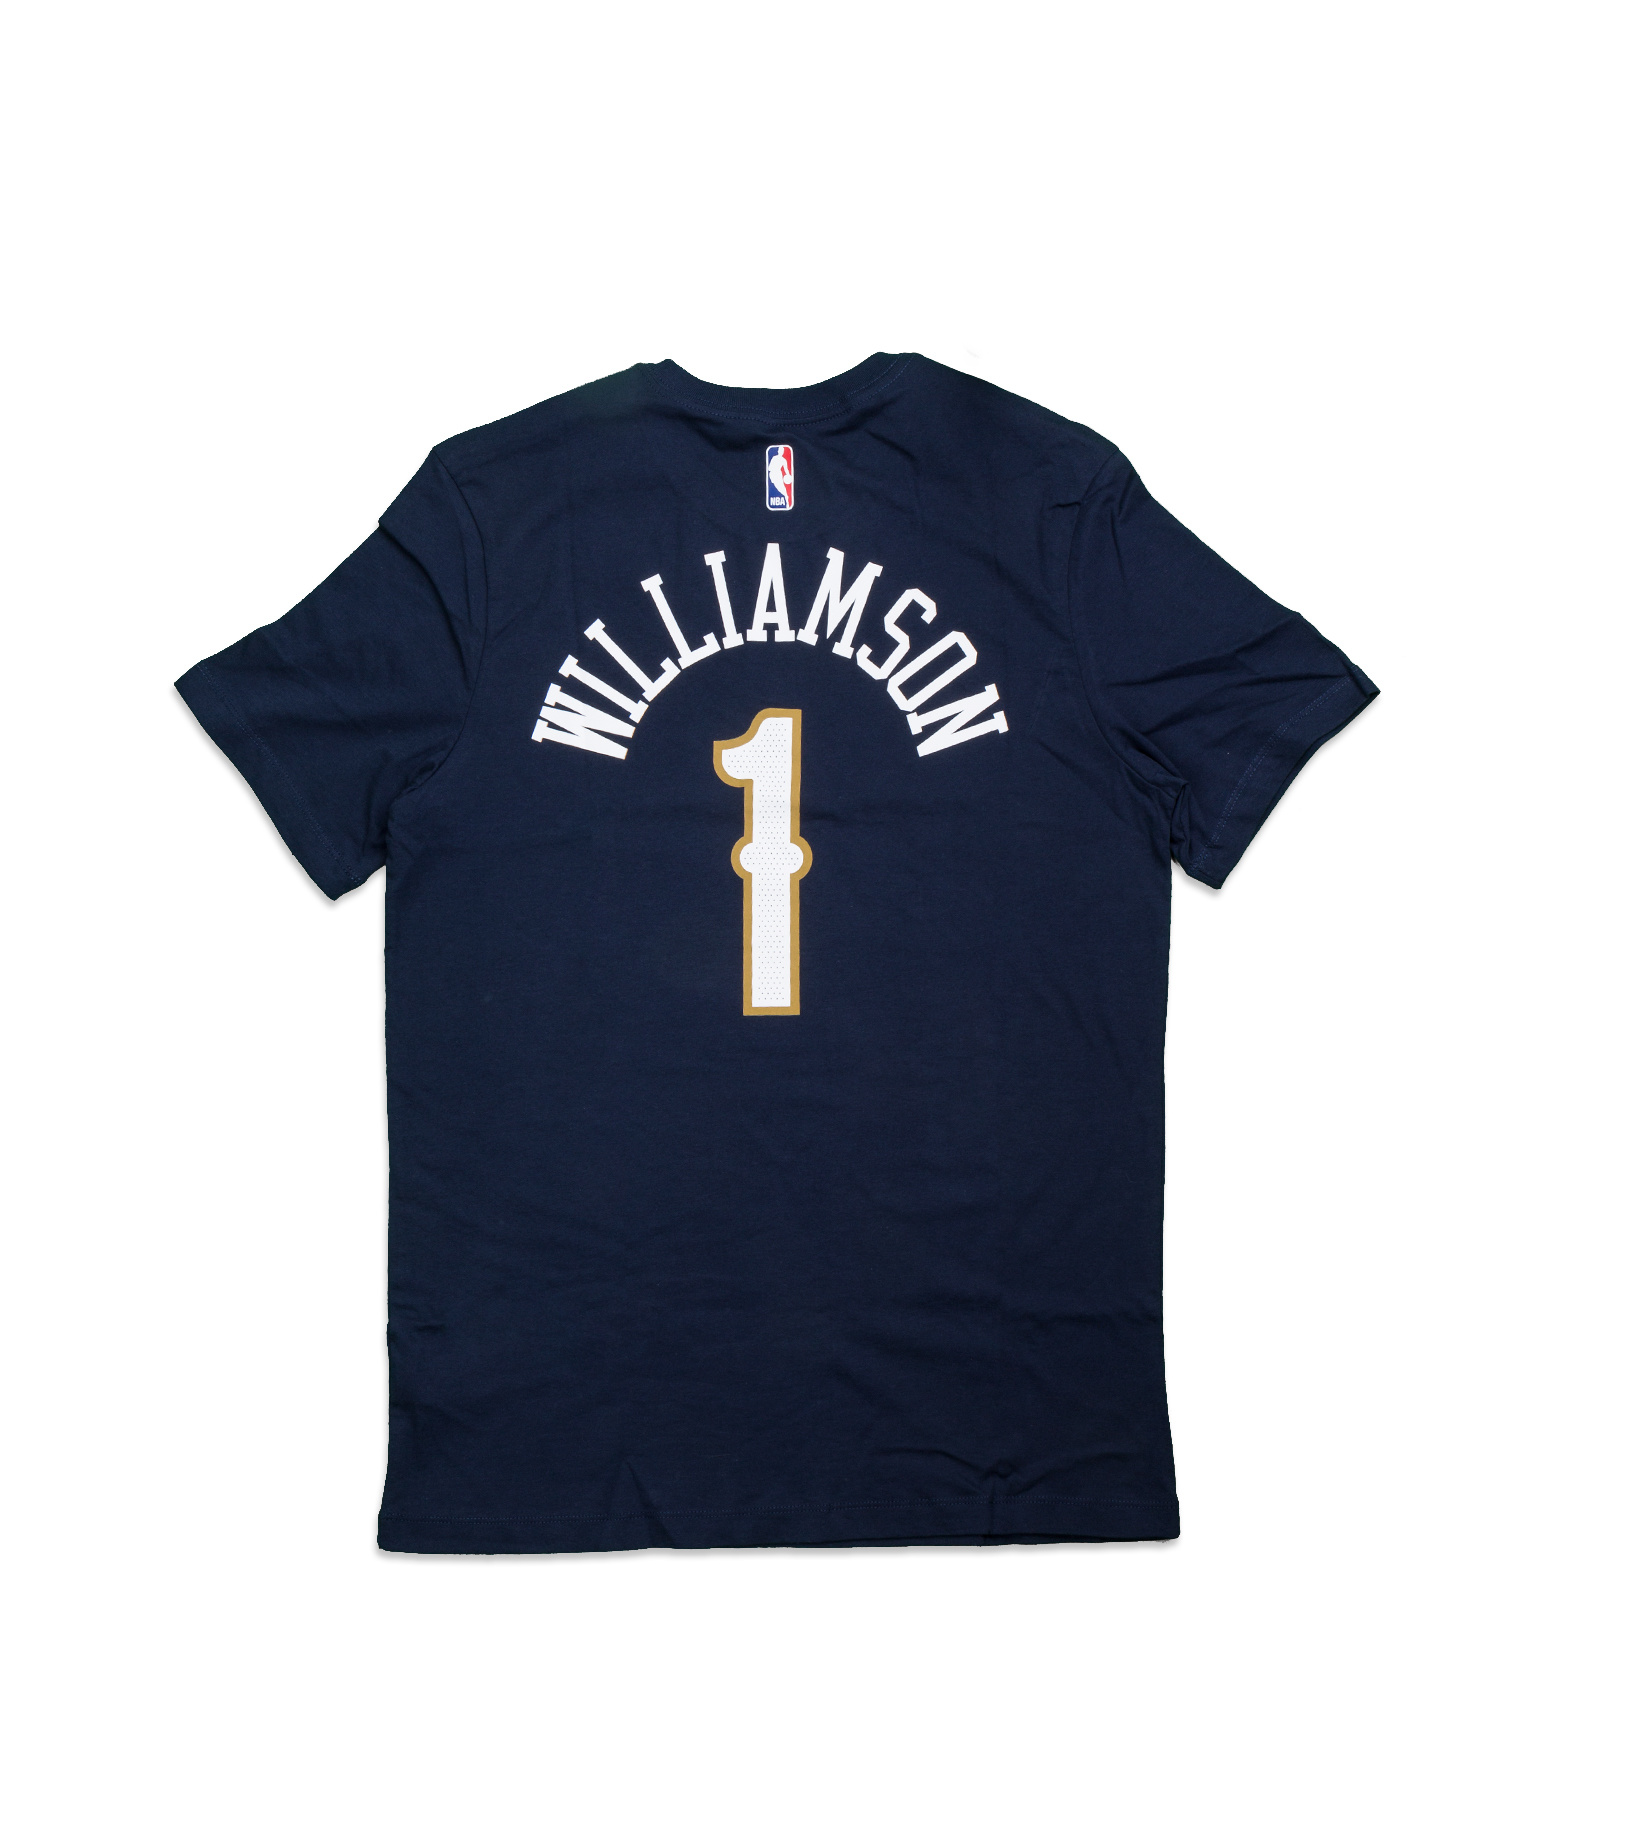 "Z. Williamson Icon Edition '20 Dri-Fit Tee ""College Navy""-3"